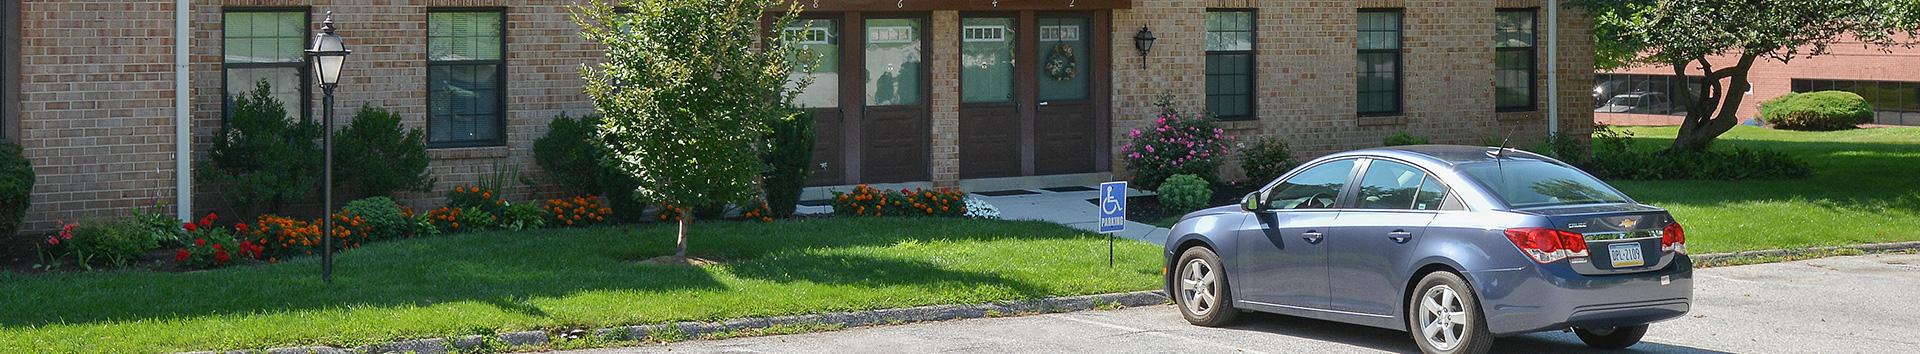 Parking Besides Apartment at Powder Mill Apartments at Manor Communities, York/Pennsylvania